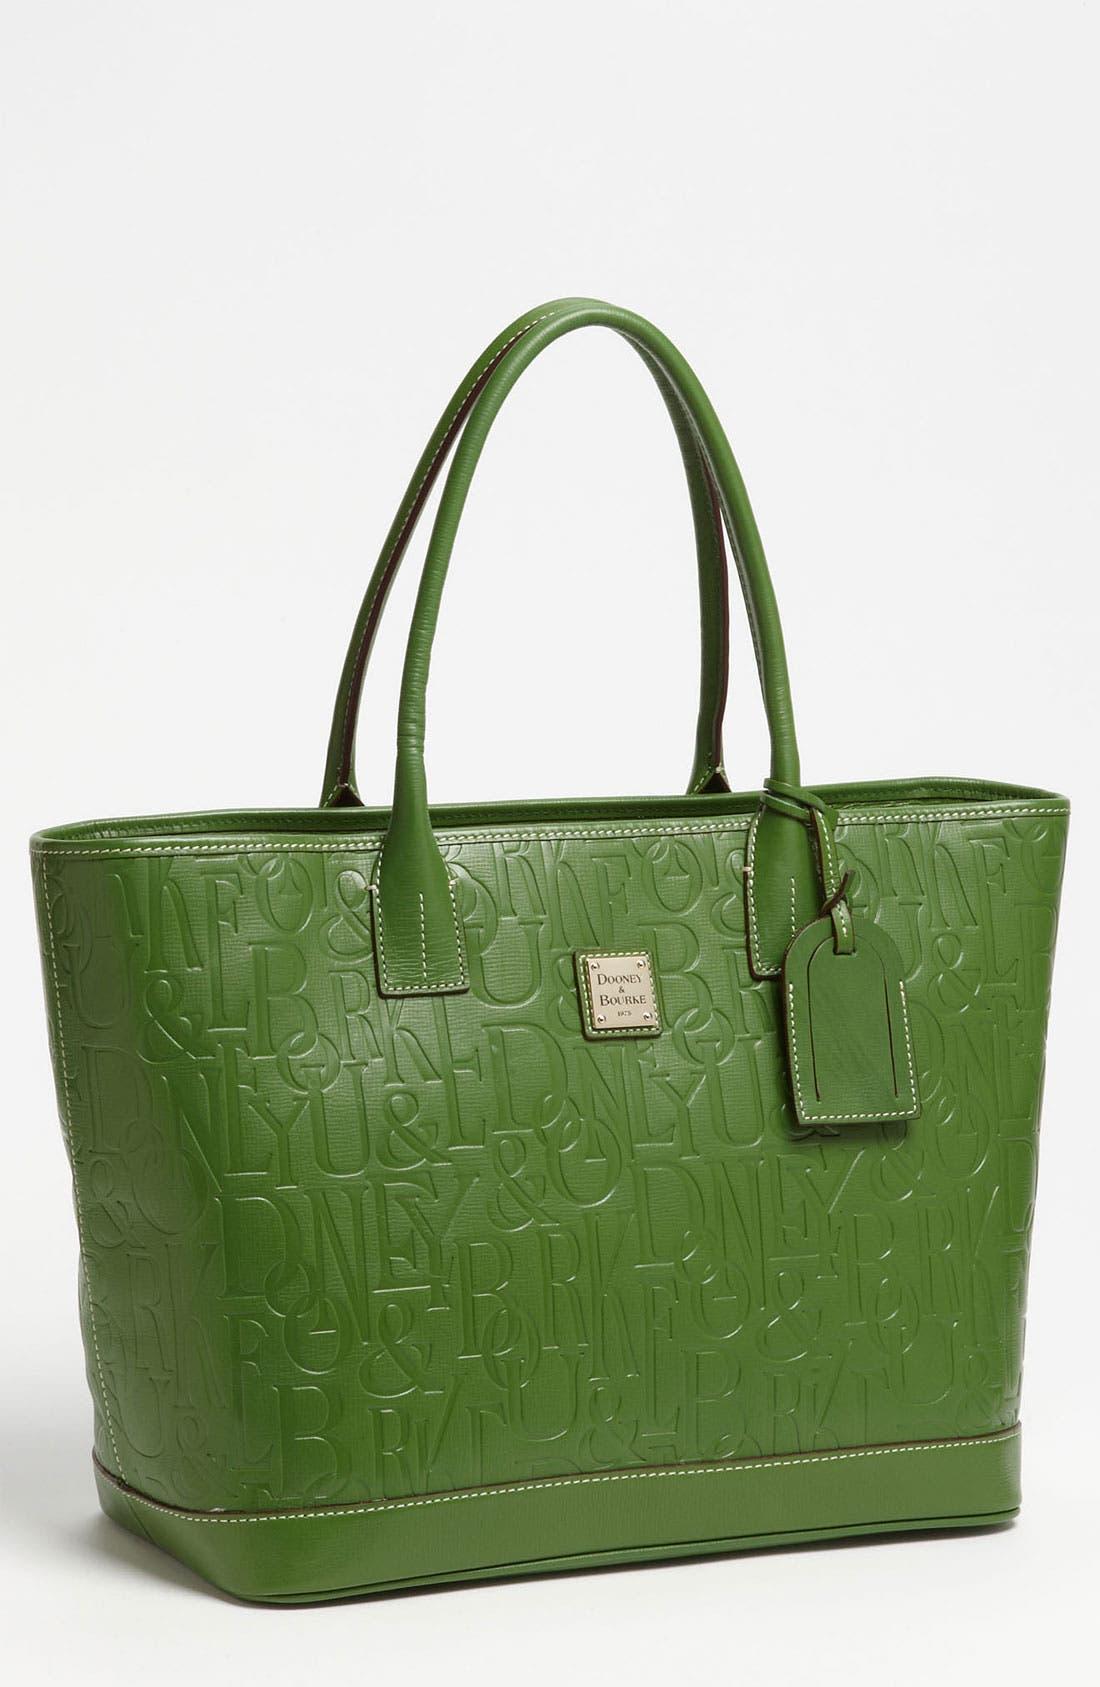 Alternate Image 1 Selected - Dooney & Bourke 'DB Retro - Medium Russel' Embossed Leather Tote